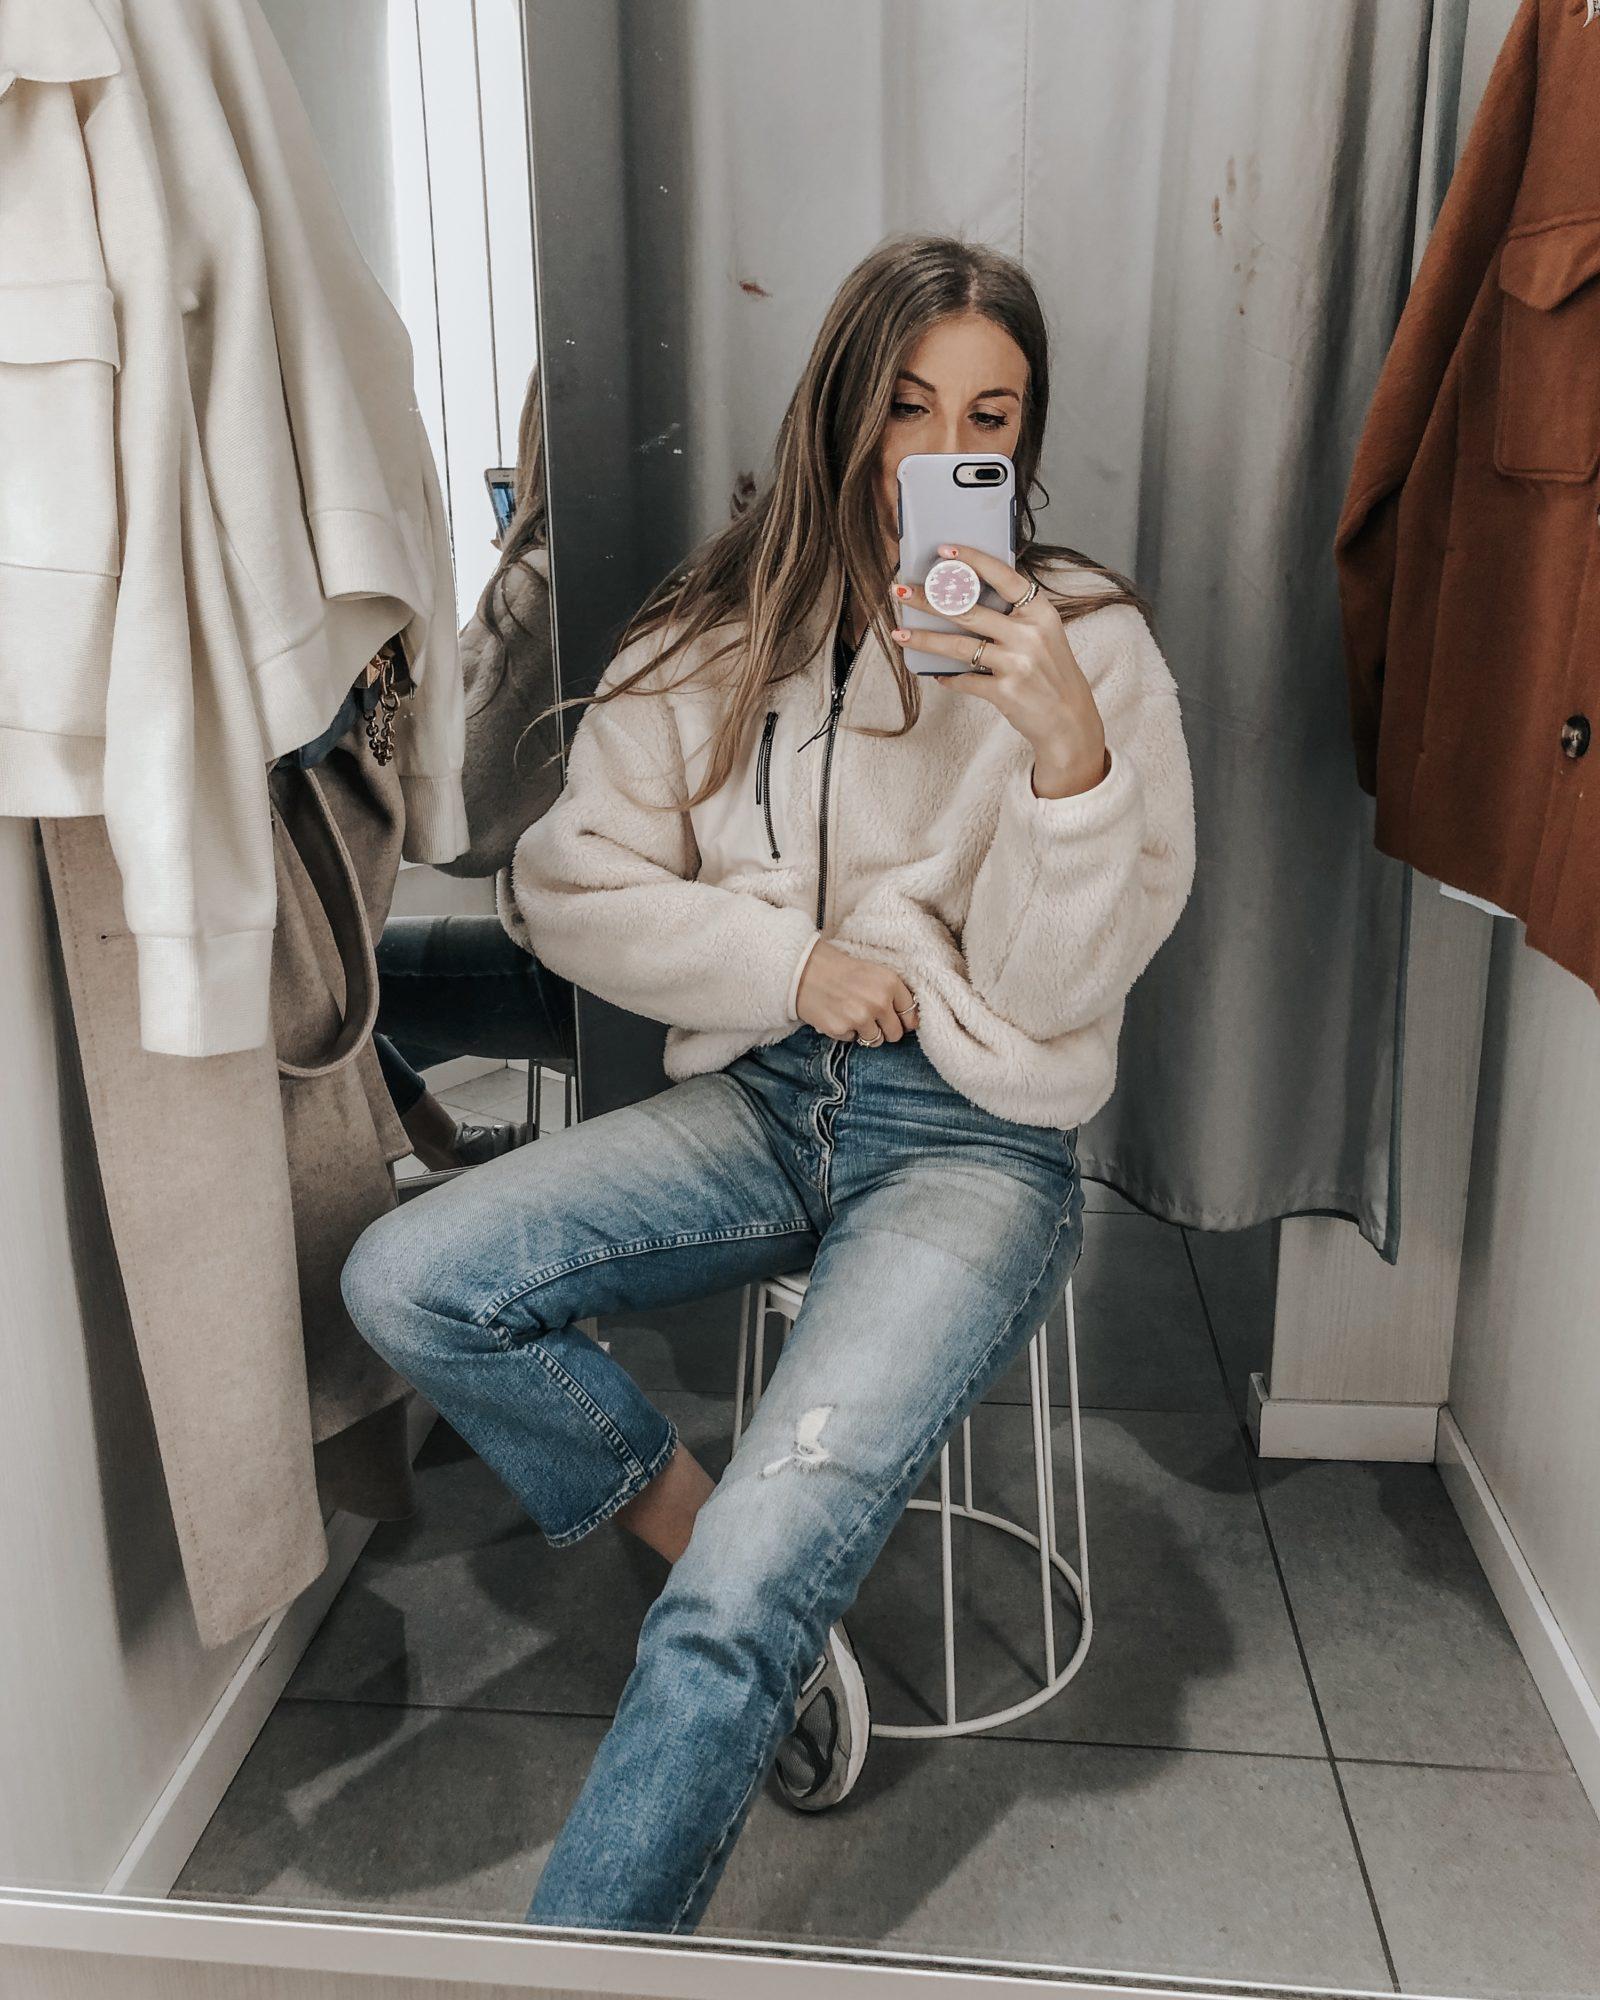 H&M Cream Fleece - Sinead Crowe Changing Room Selfie - Neutral Outfit Idea